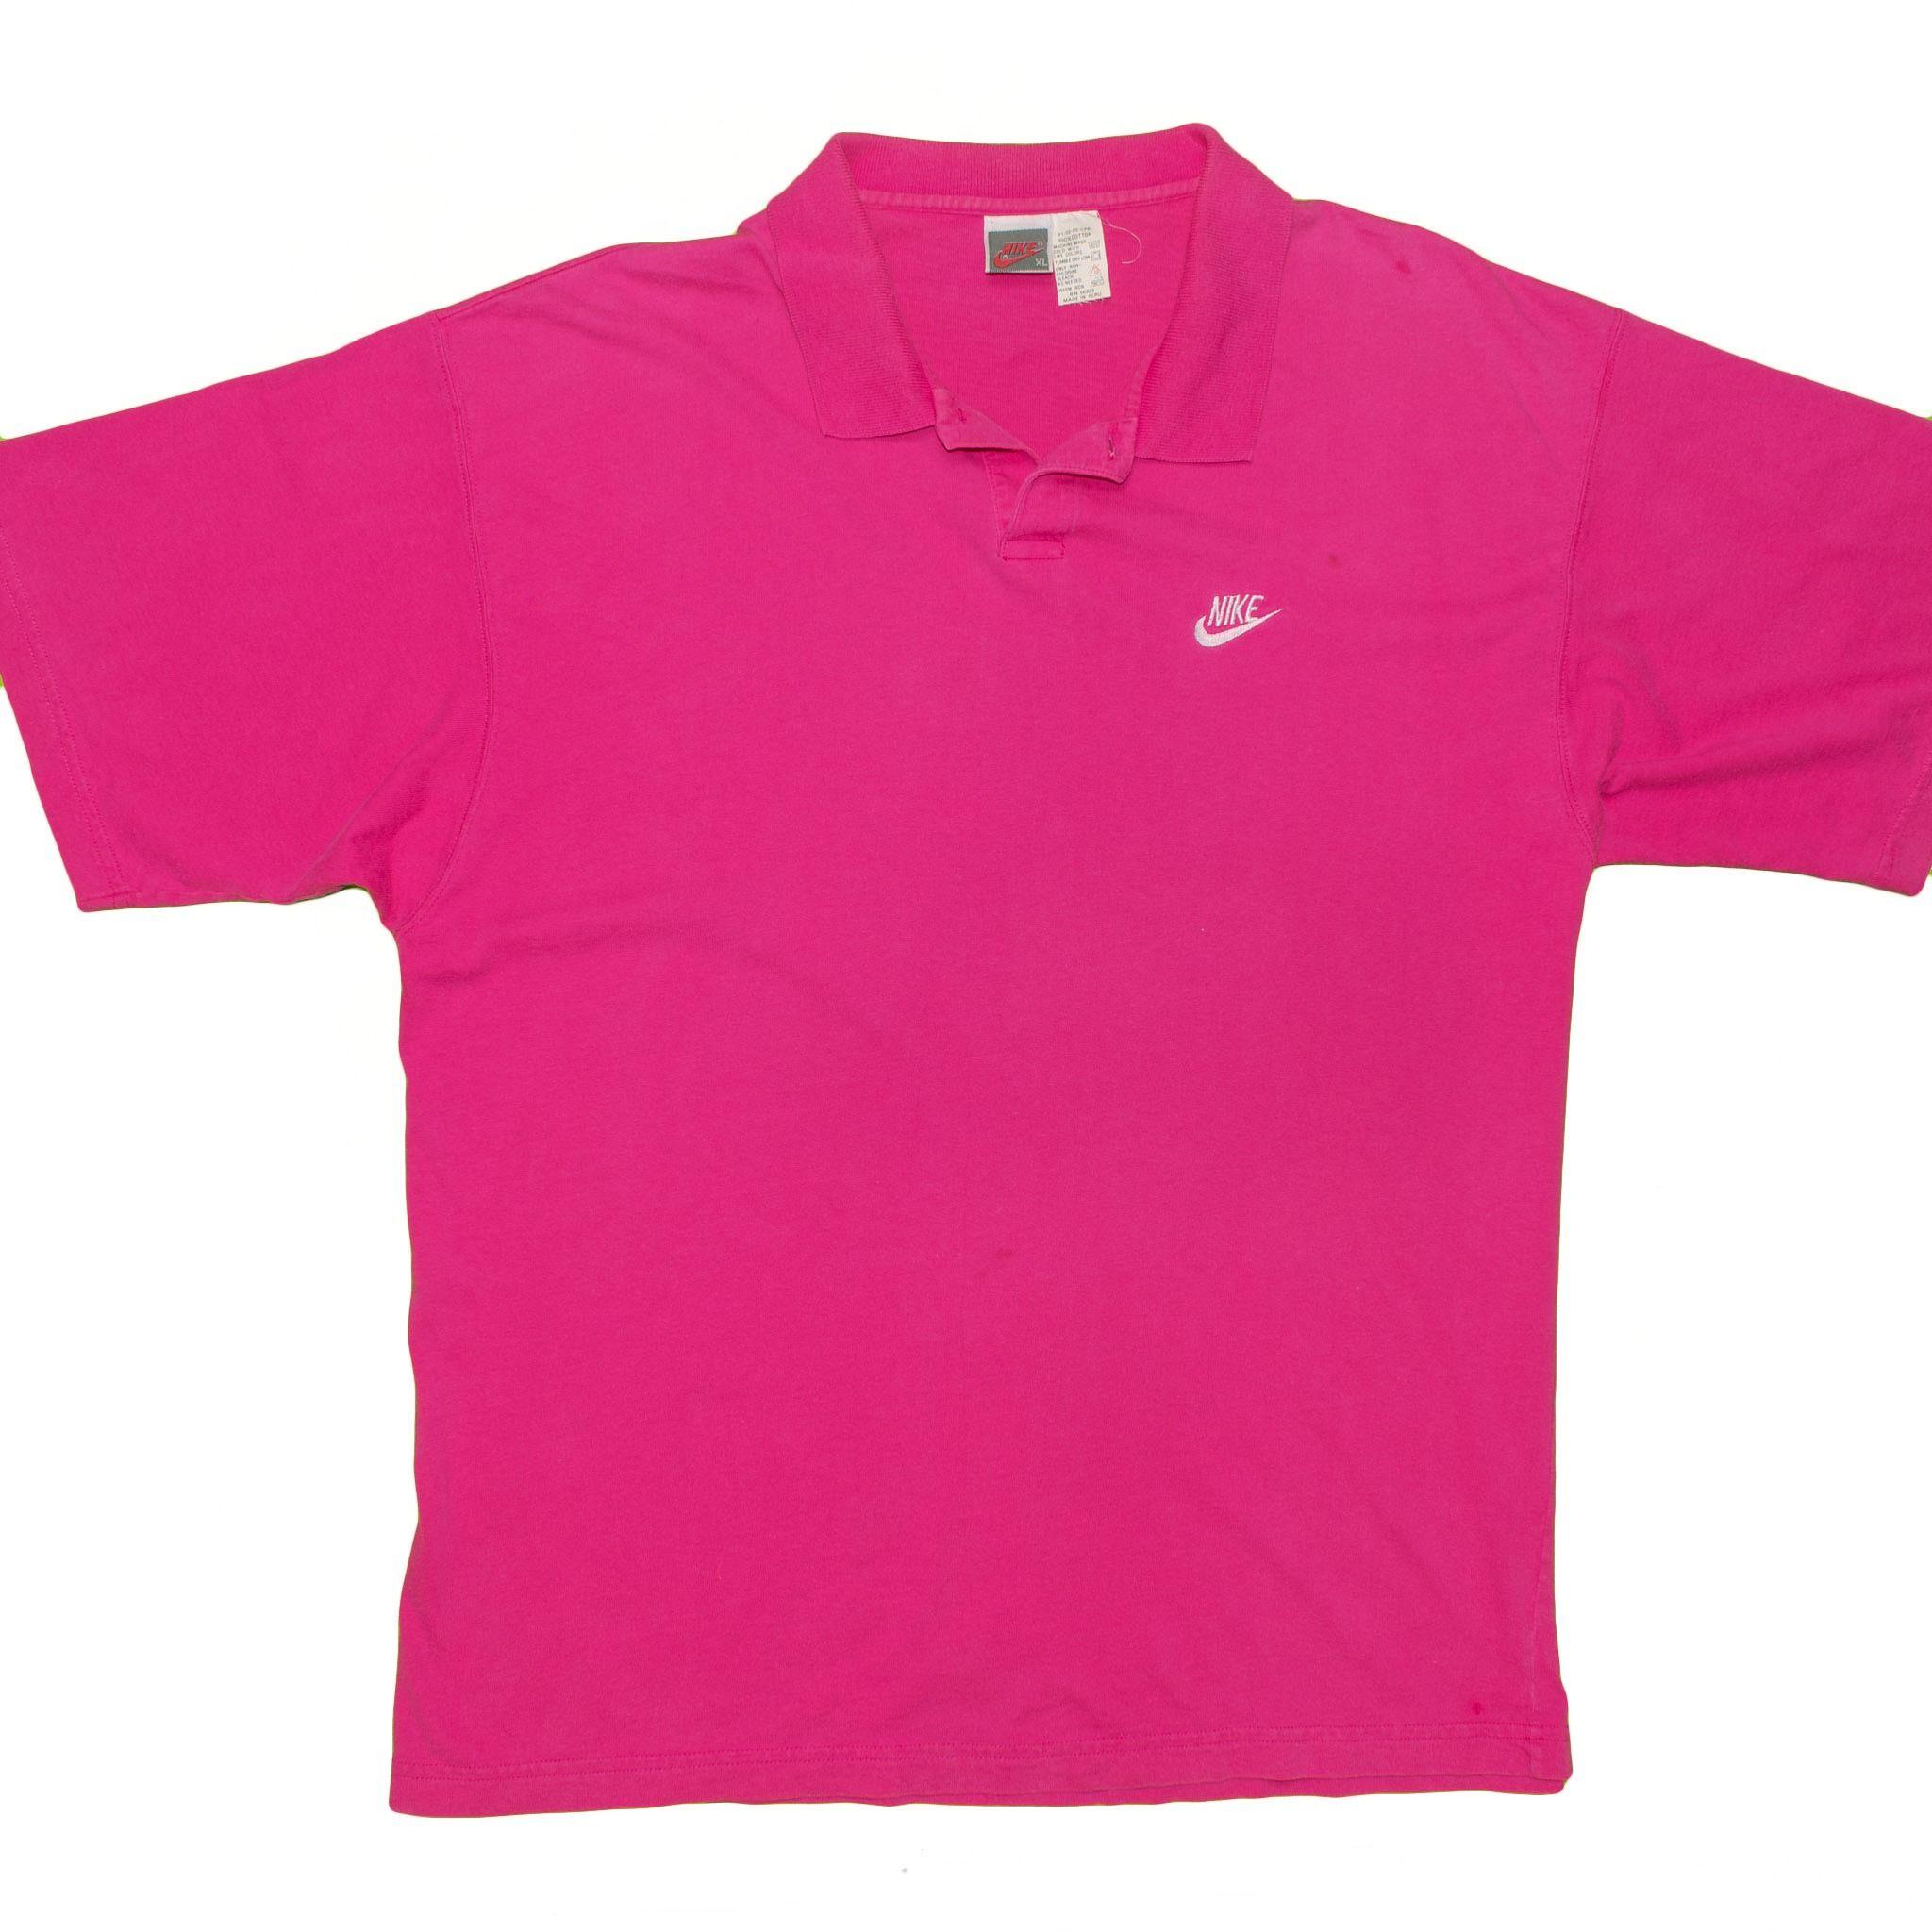 Vintage 80's 90's Nike Polo Shirt Men's XLarge Pink Short